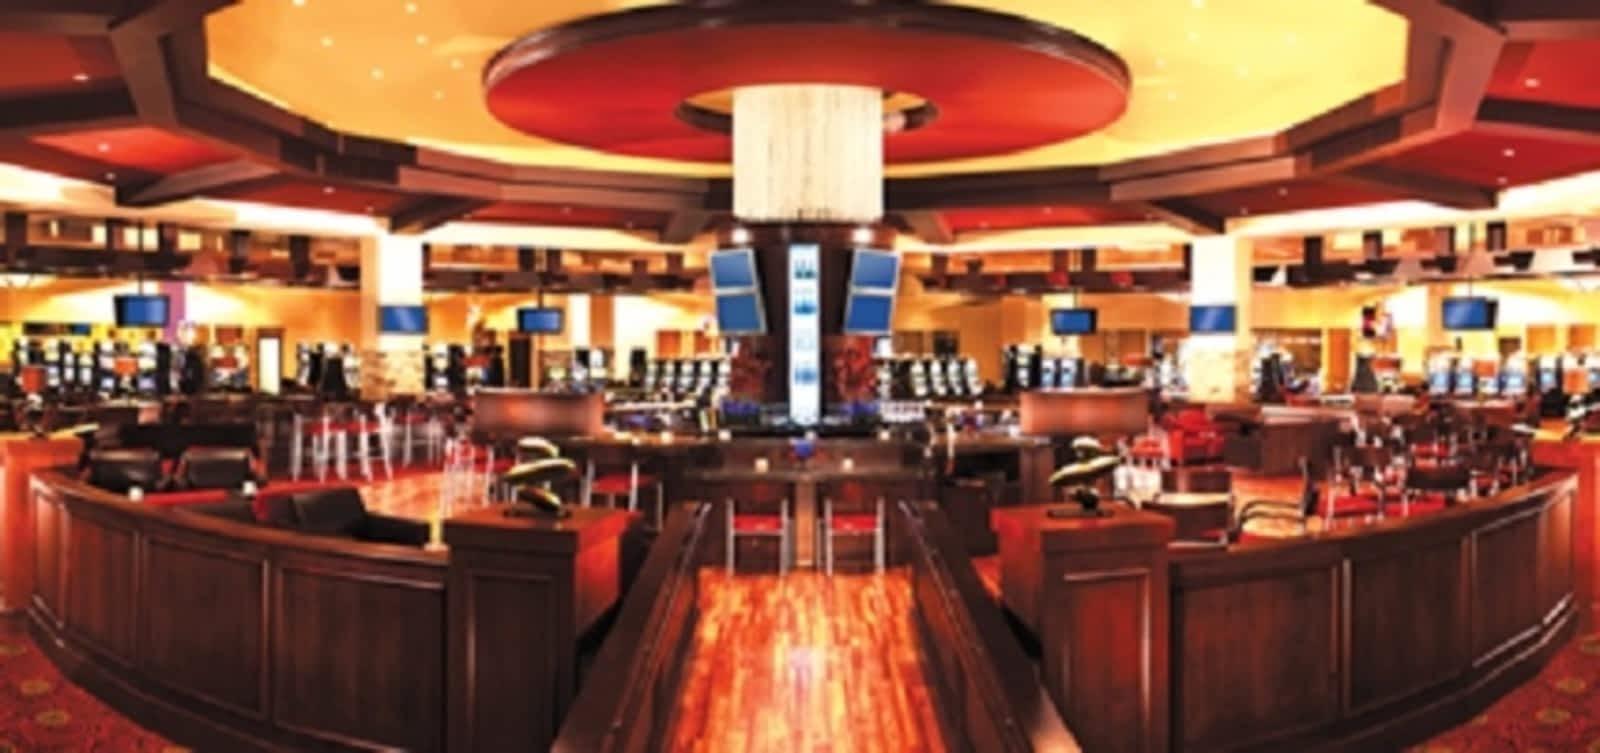 River cree casino hours potawatomi casino bingo prices